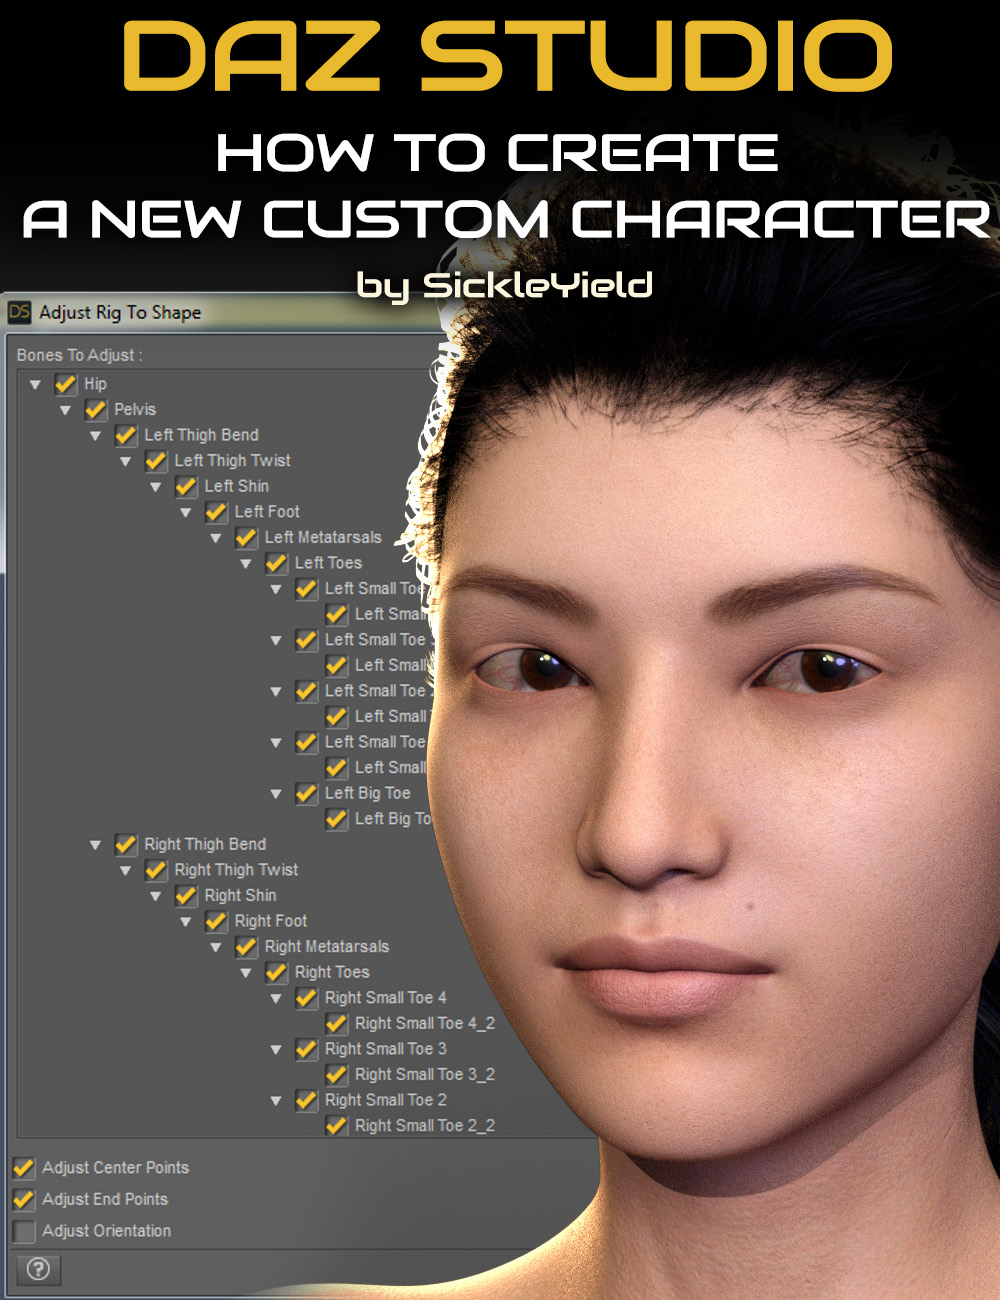 How to Create a New Custom Daz Studio Character by: Digital Art LiveSickleyield, 3D Models by Daz 3D